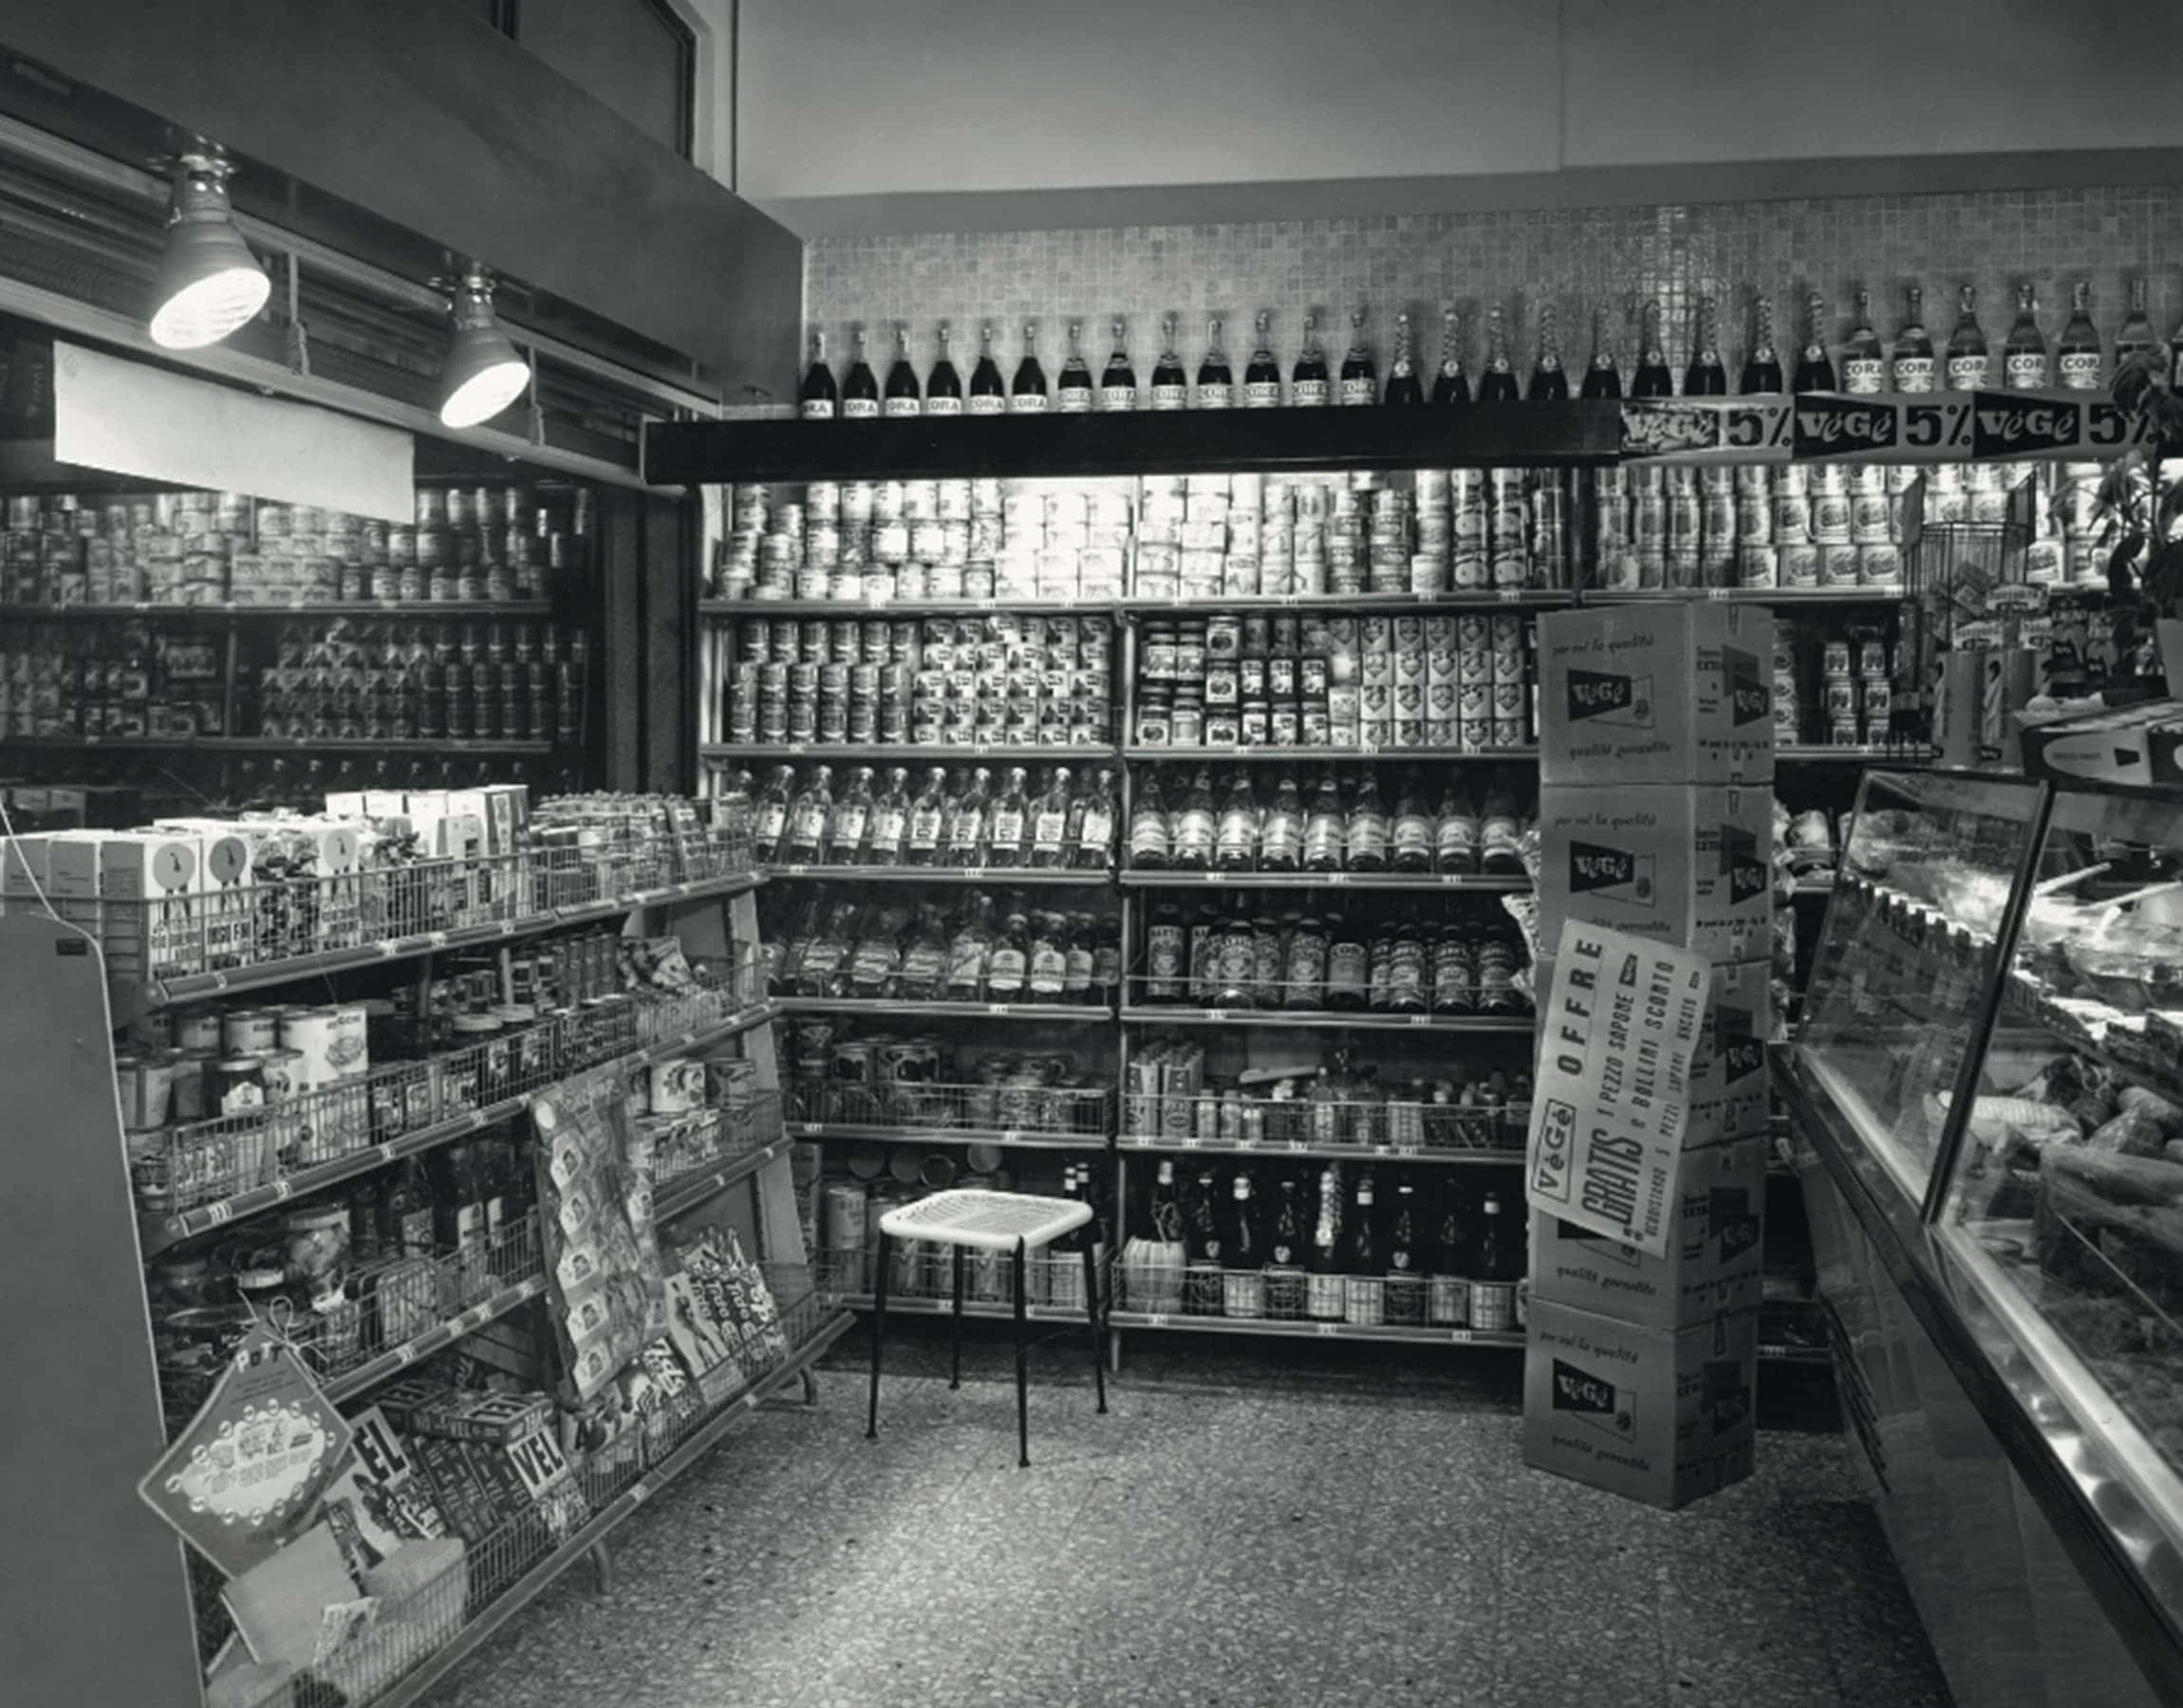 Foto storica di un negozio VéGé